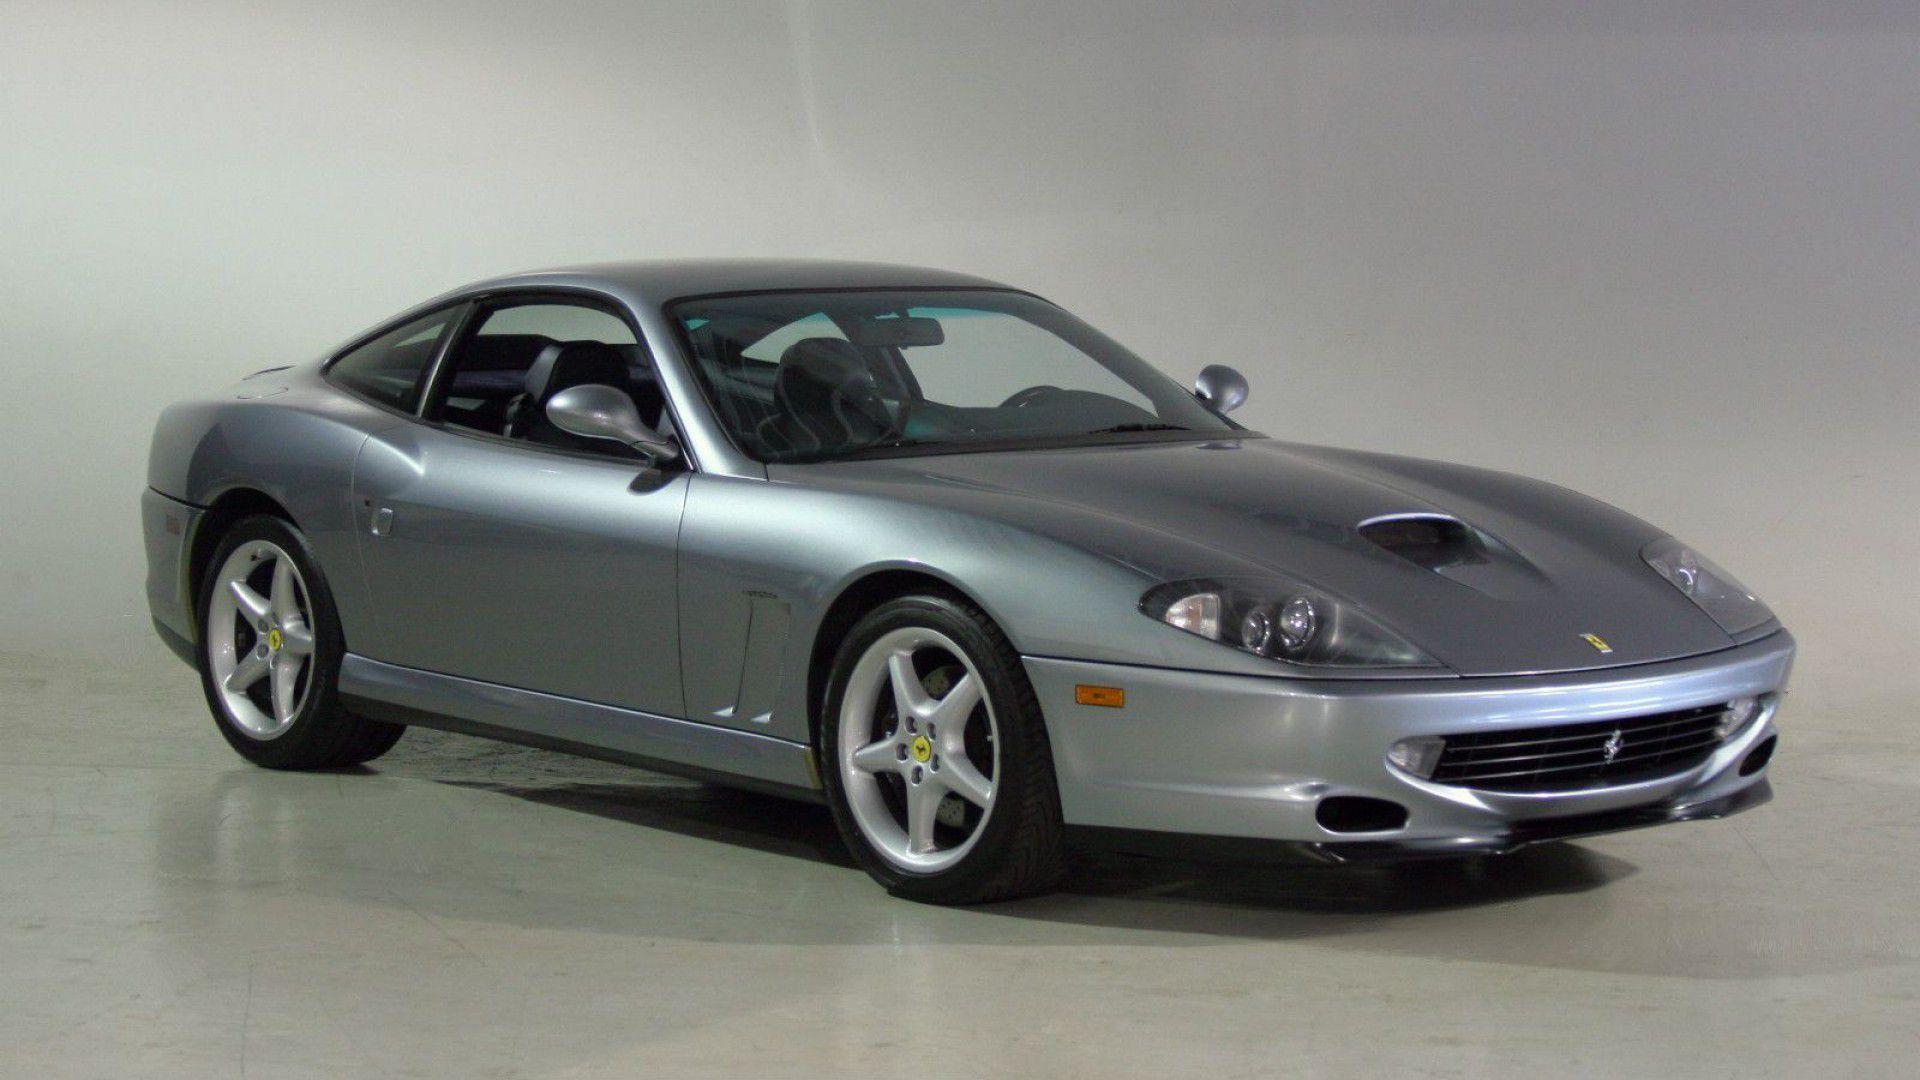 Ferrari 550 Maranello 187 Definitive List Cars